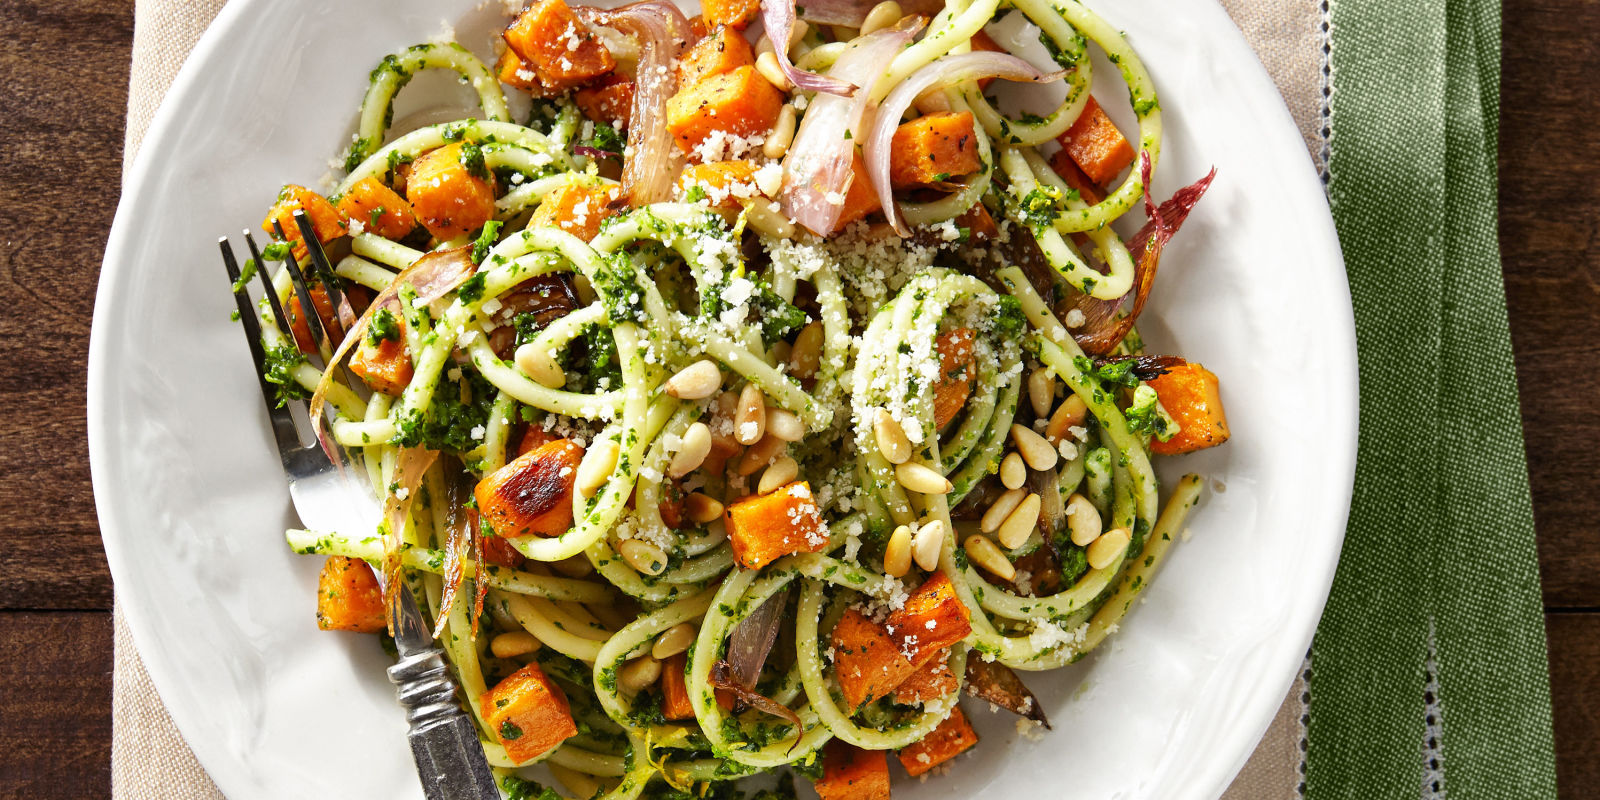 45 Easy Pasta Dinner Recipes - Best Family Pasta Dishes